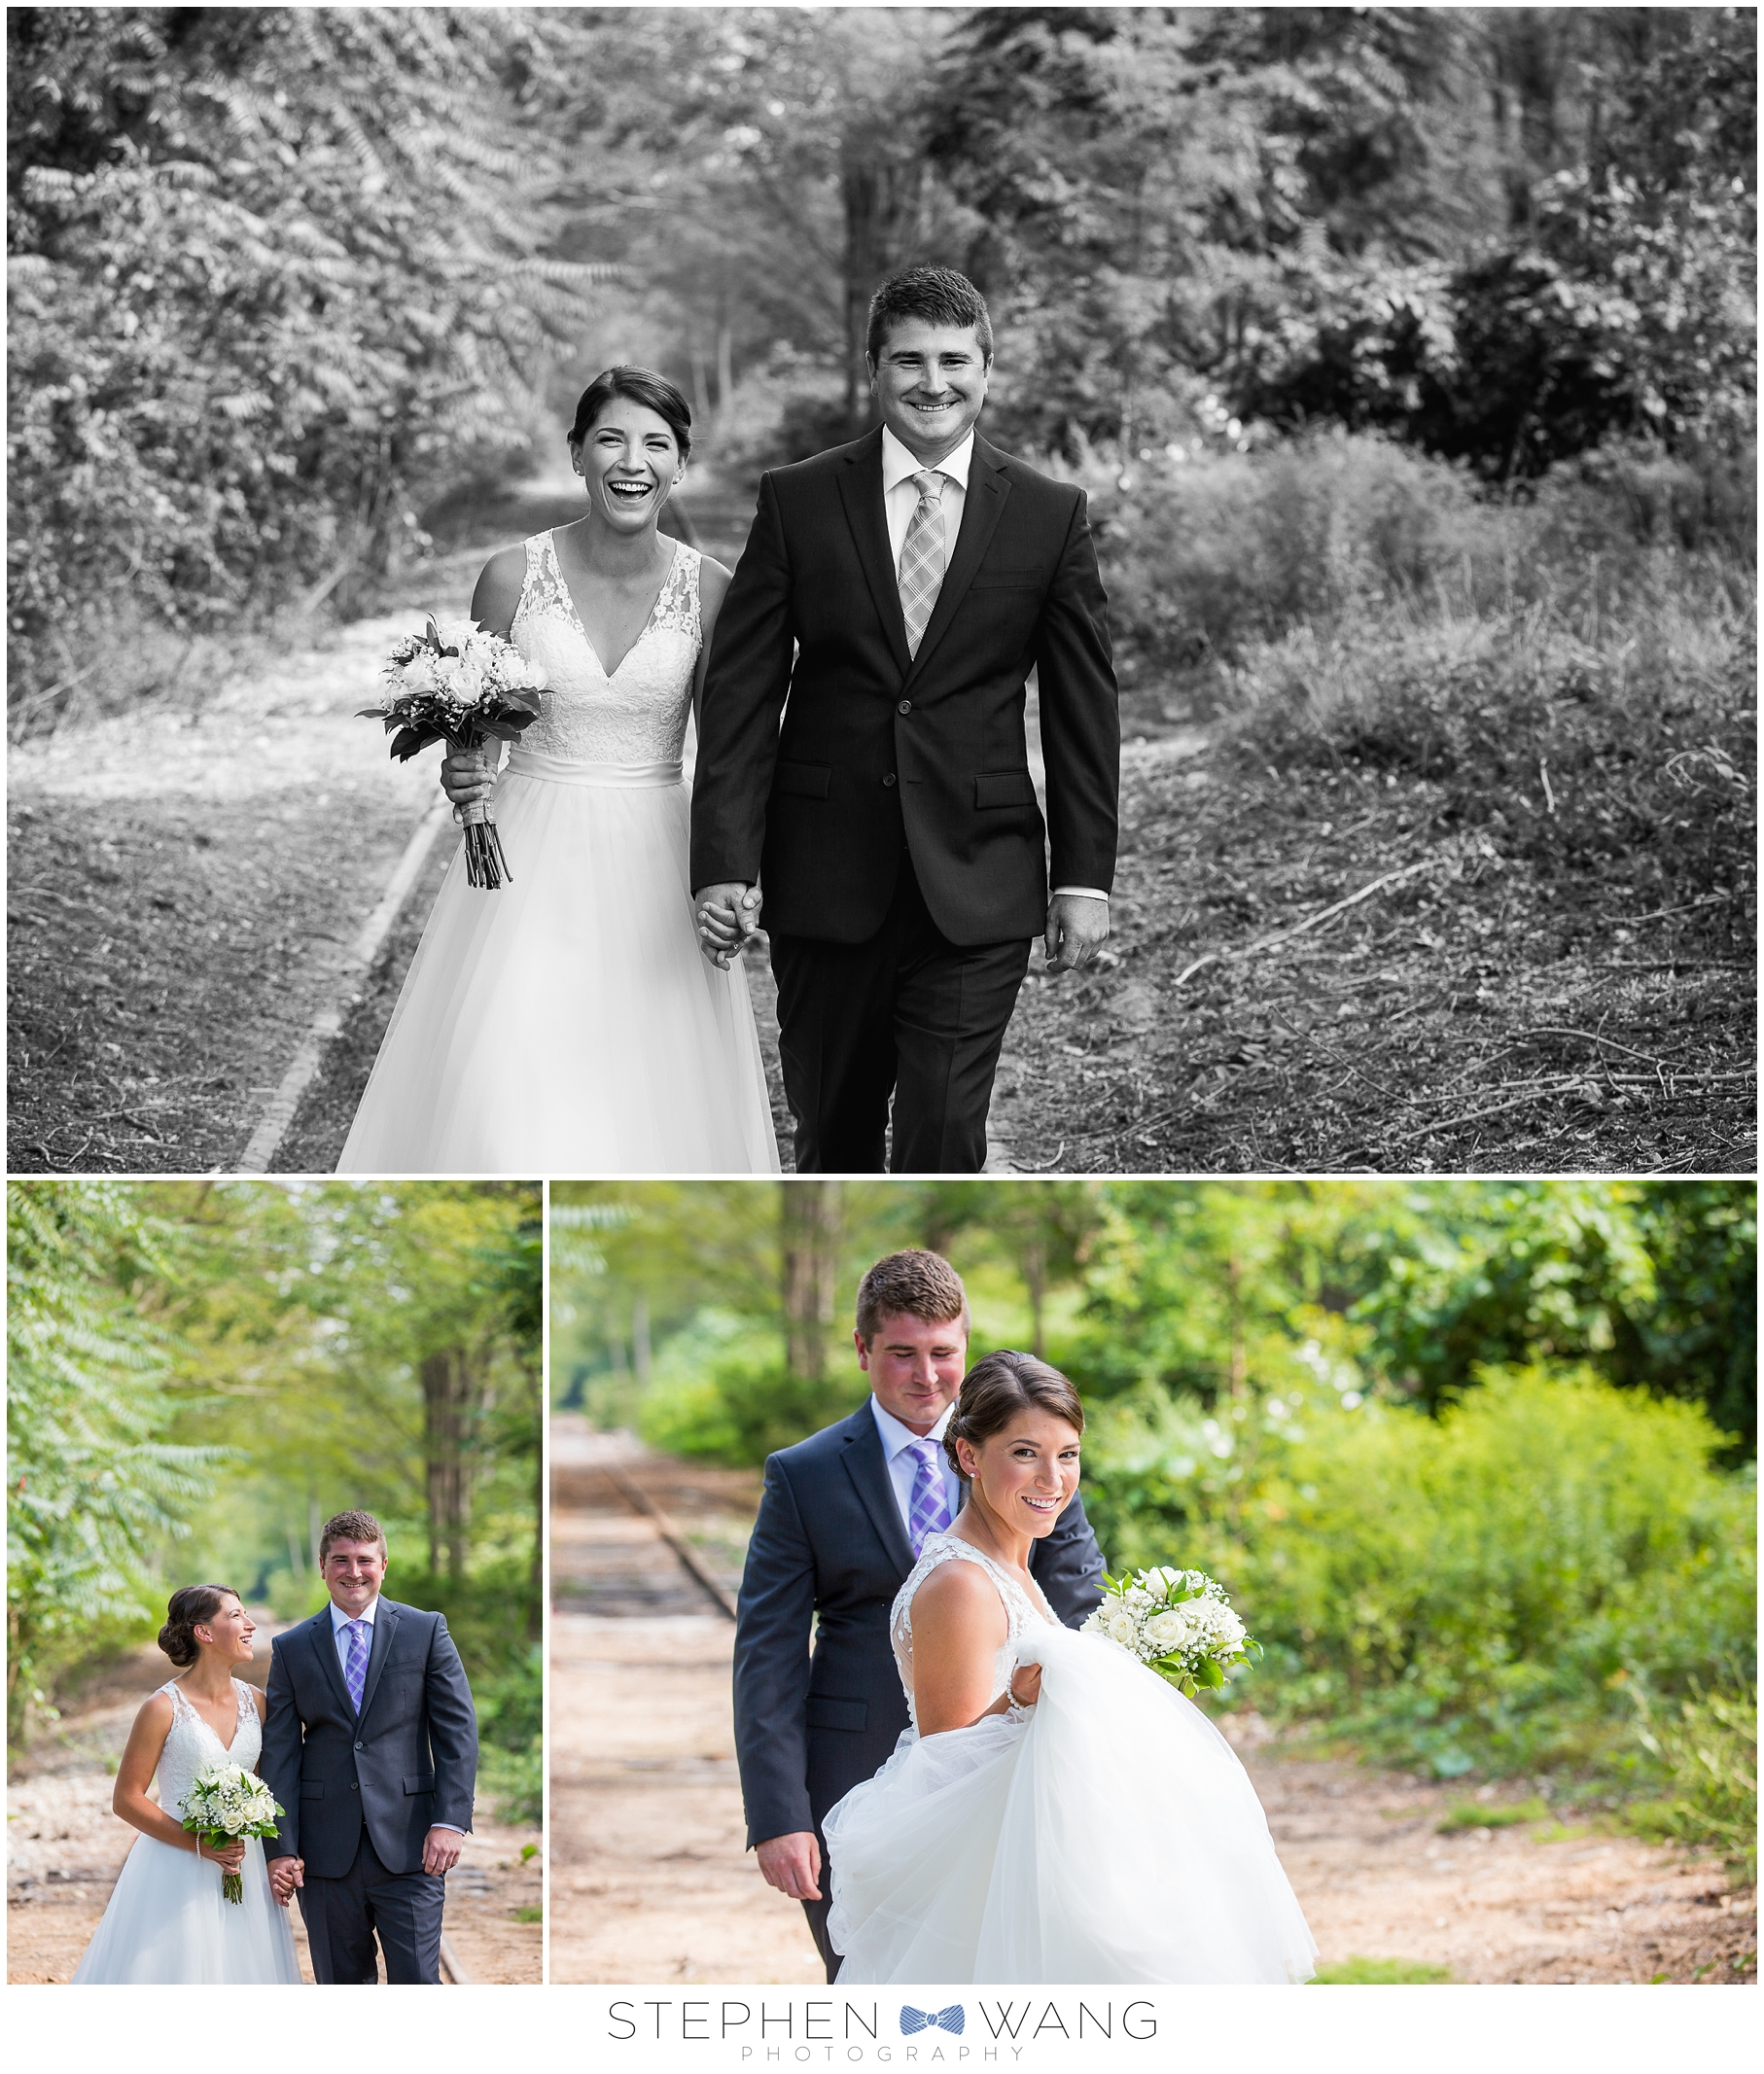 Stephen Wang Photography wedding photographer haddam connecticut wedding connecticut photographer philadlephia photographer pennsylvania wedding photographer bride and groom00015.jpg